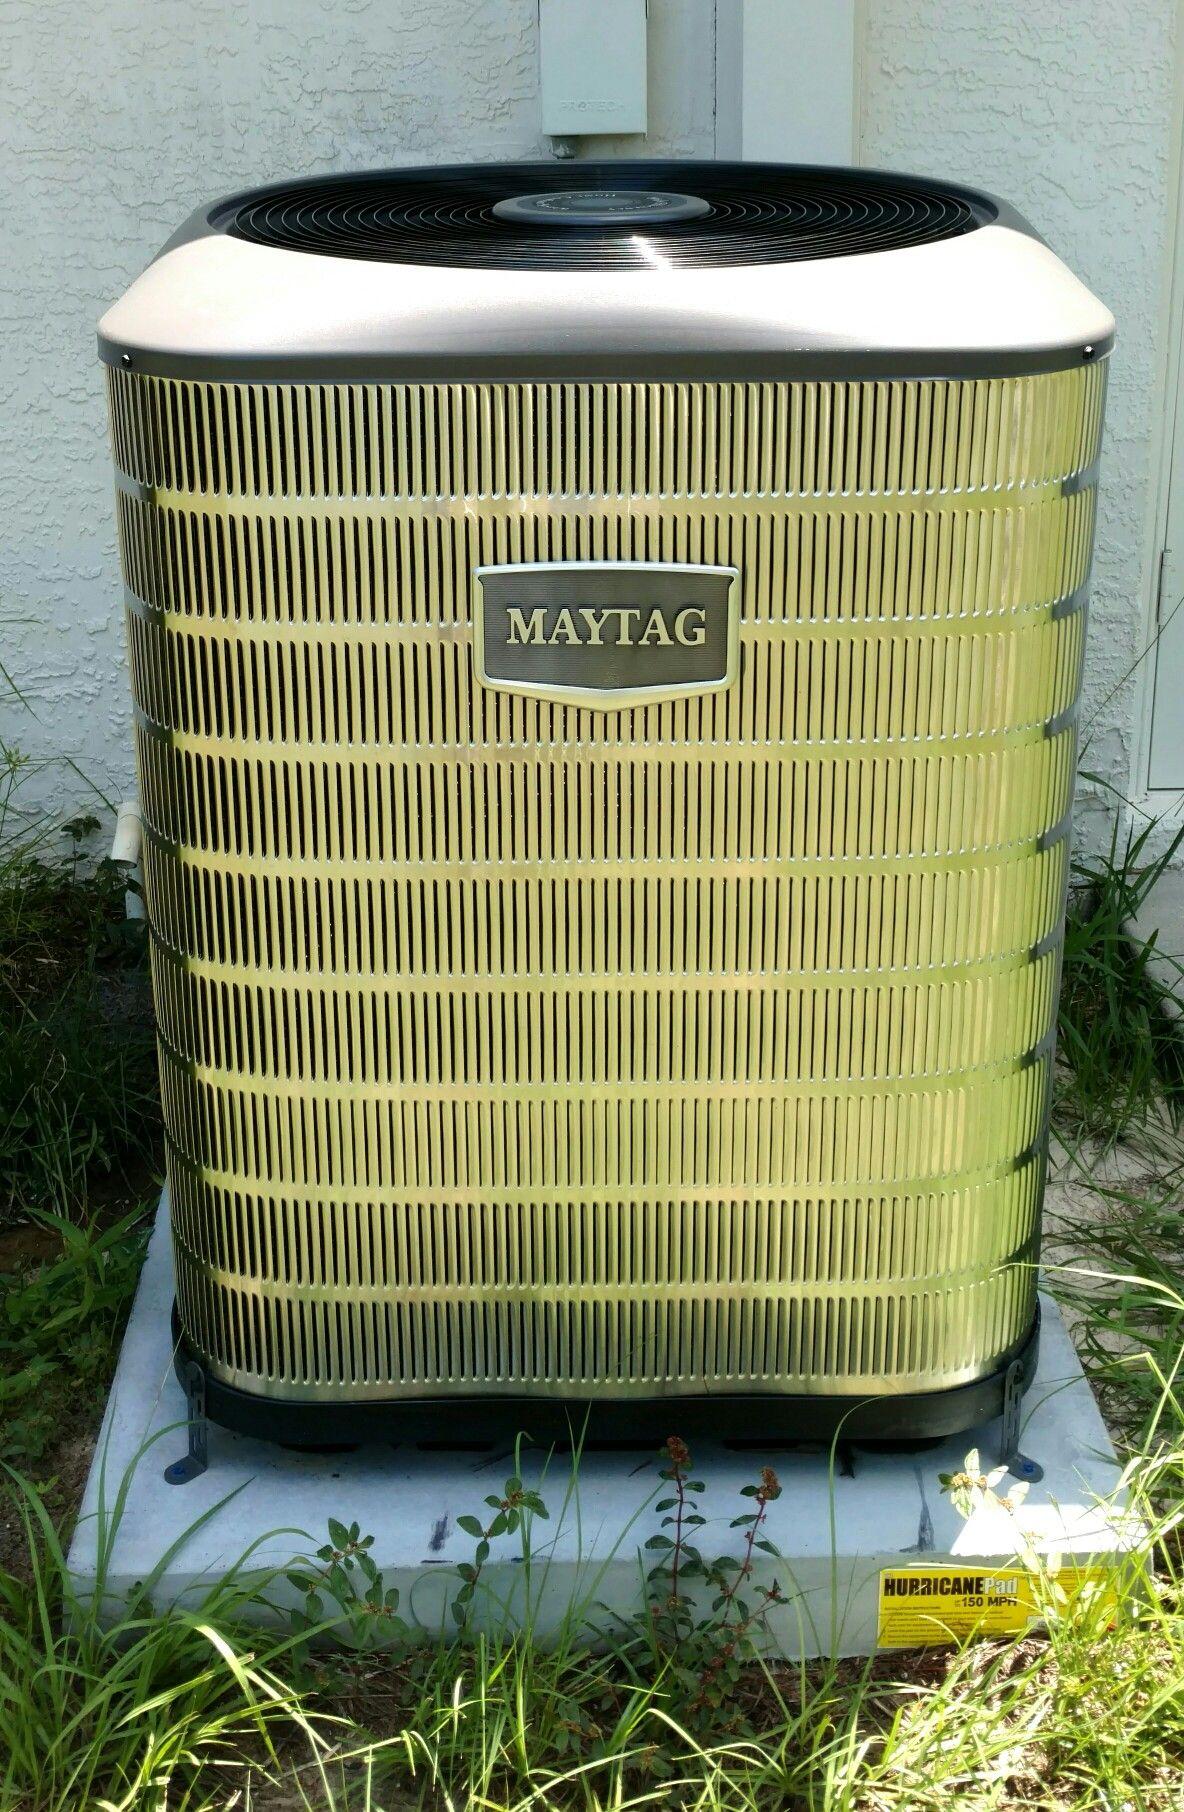 Maytag 15 seer Heat Pump split system installed by Beacon